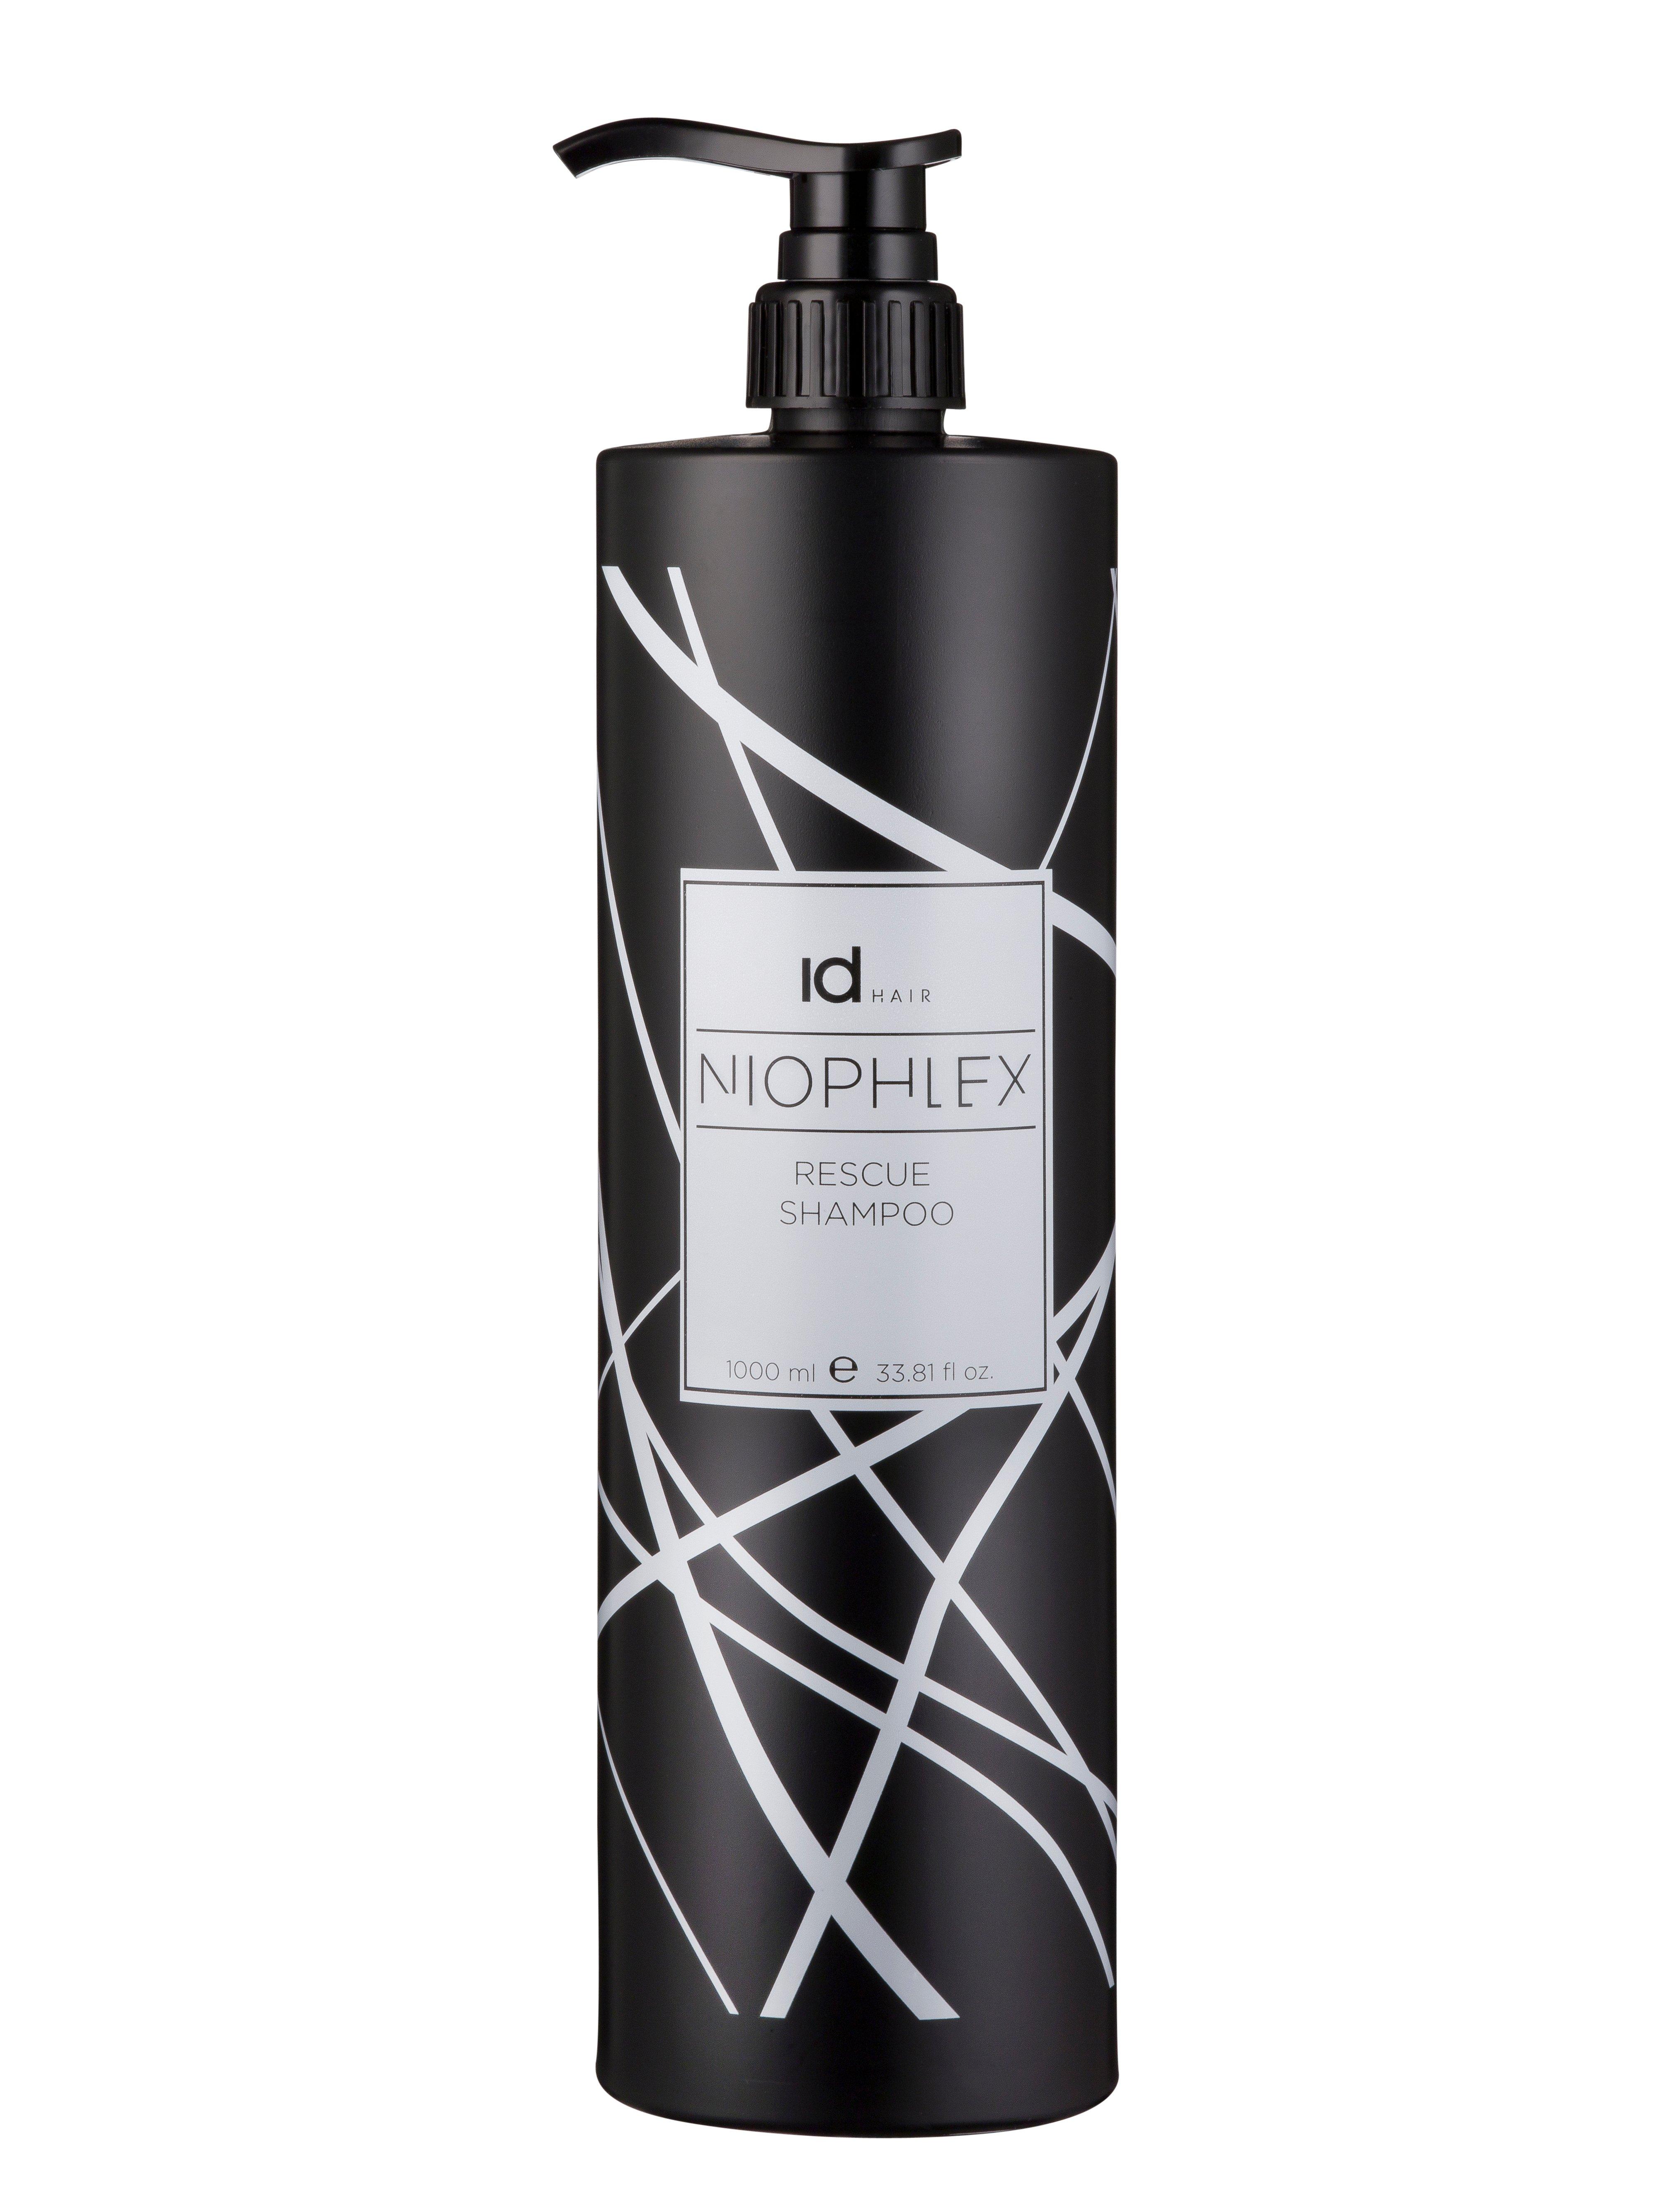 IdHAIR - Niophlex Shampoo Rescue 1000 ml